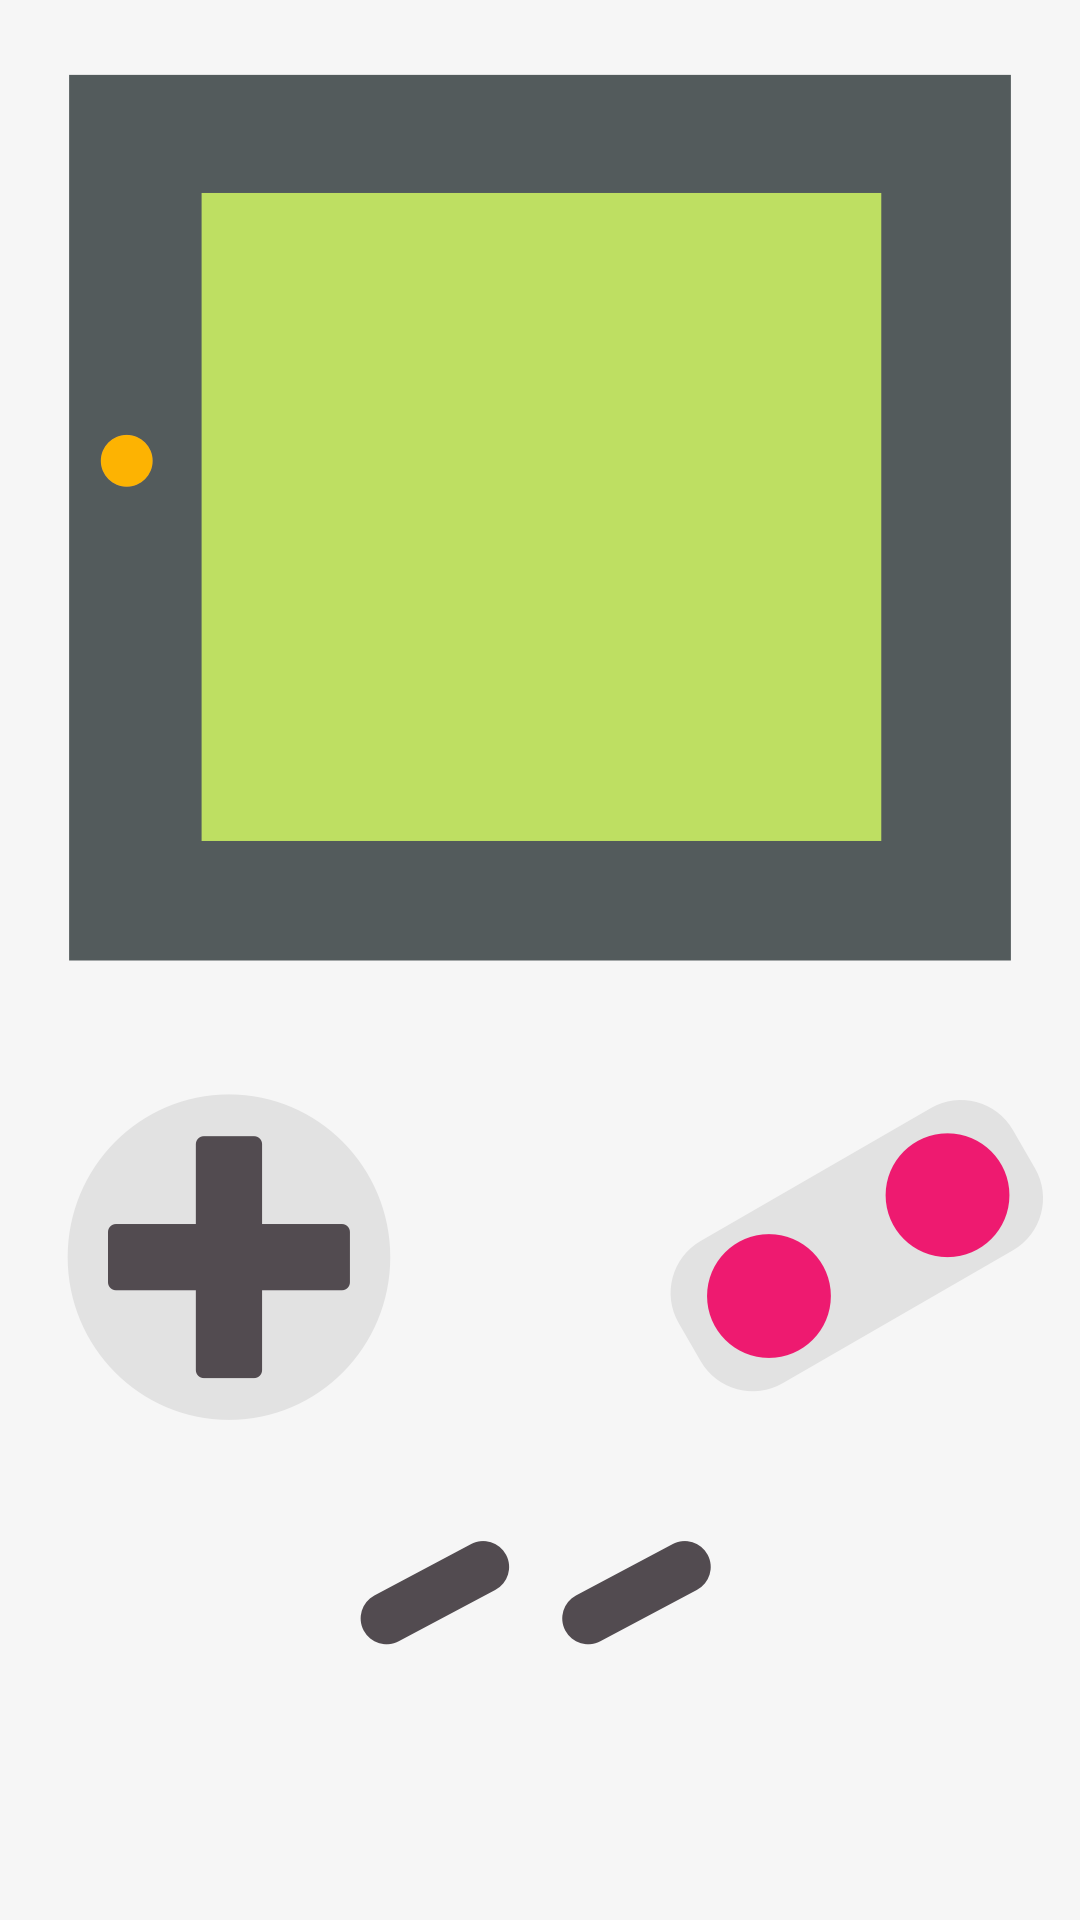 Game Boy Game Wallpaper Iphone Iphone Wallpaper Kanye Gaming Wallpapers